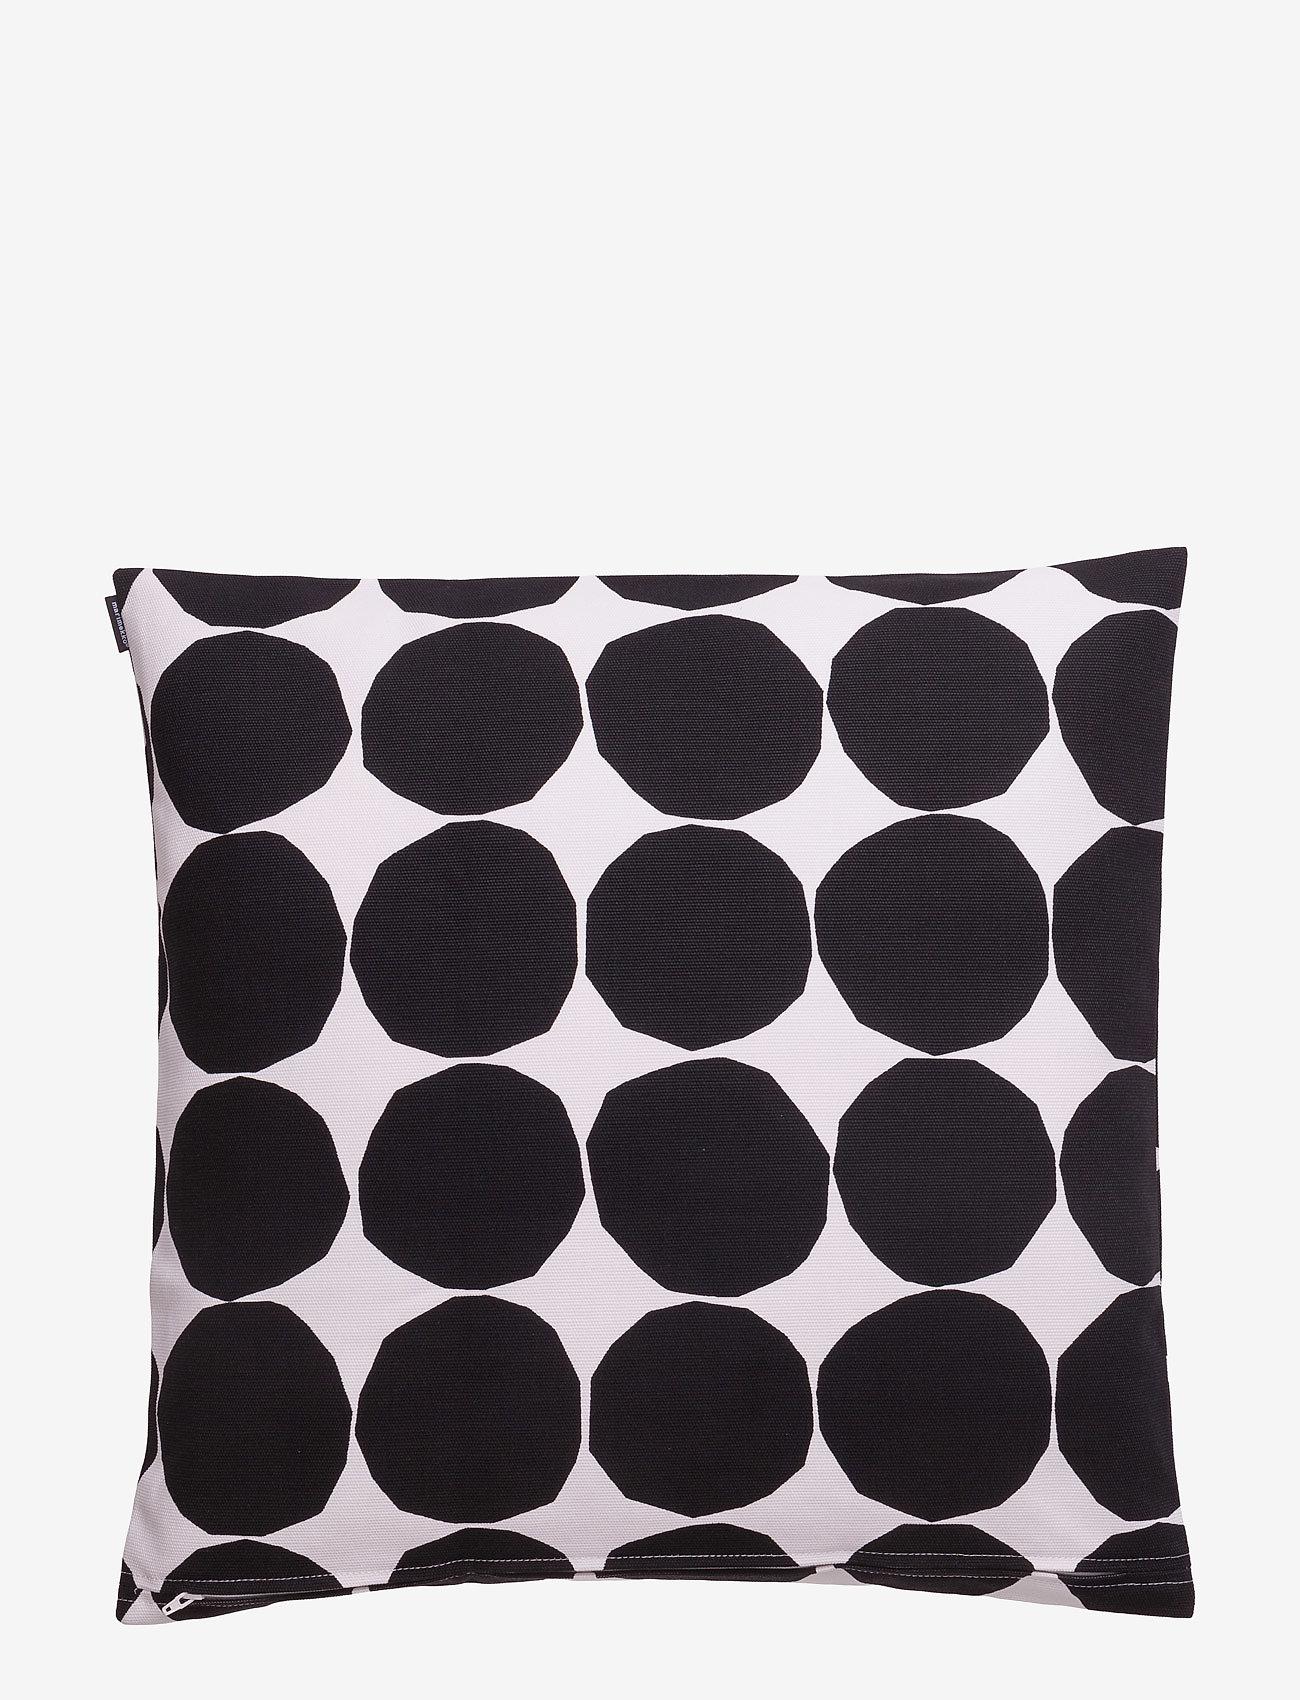 Marimekko Home - PIENET KIVET CUSHION COVER - poszewki na poduszki ozdobne - white,black - 1